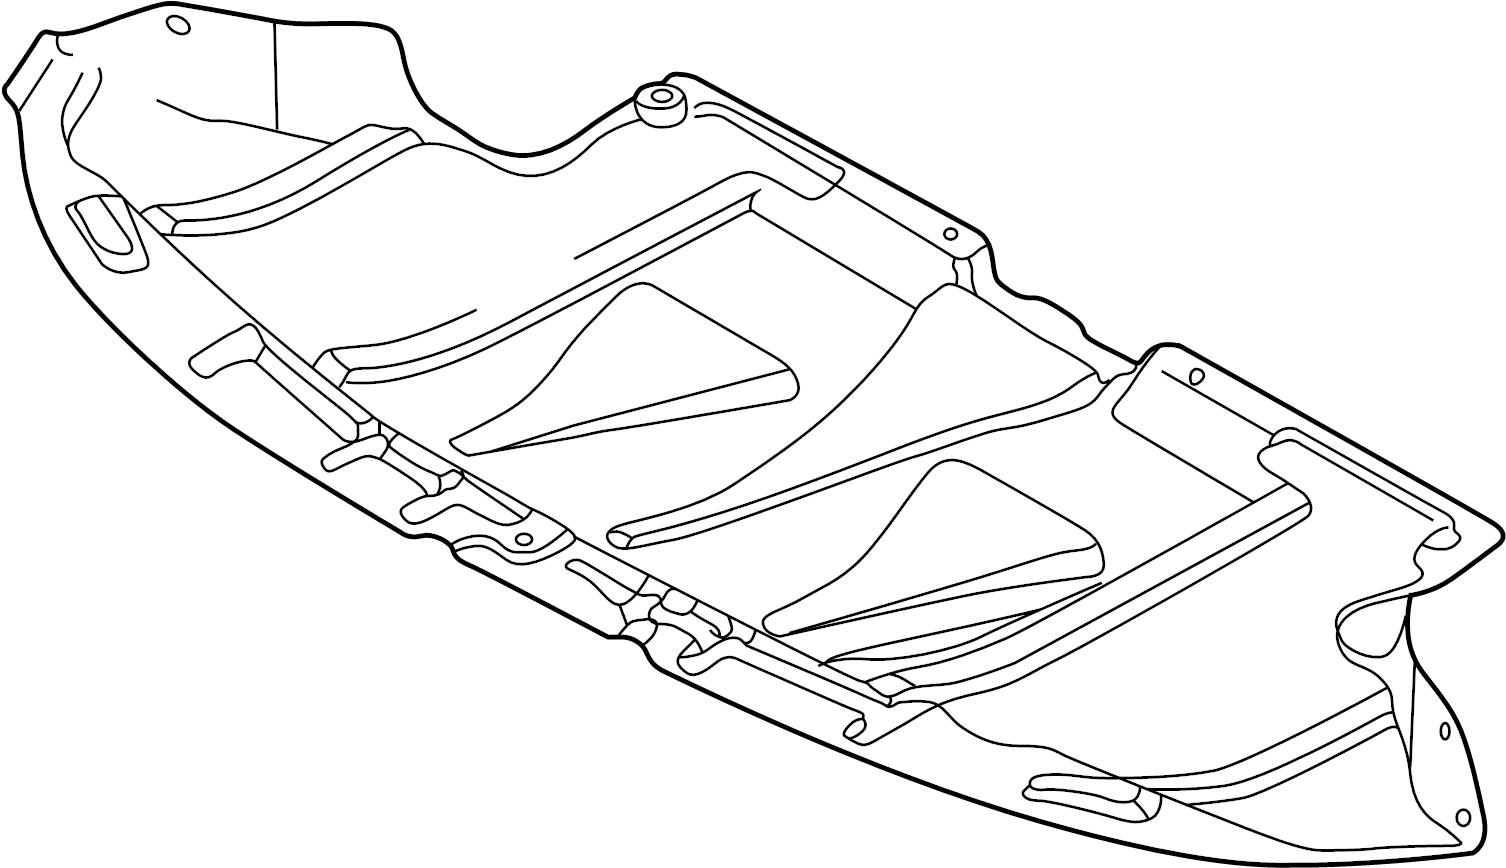 2004 Audi S4 Base Sedan Shield. LITER, Splash, SHIELDS